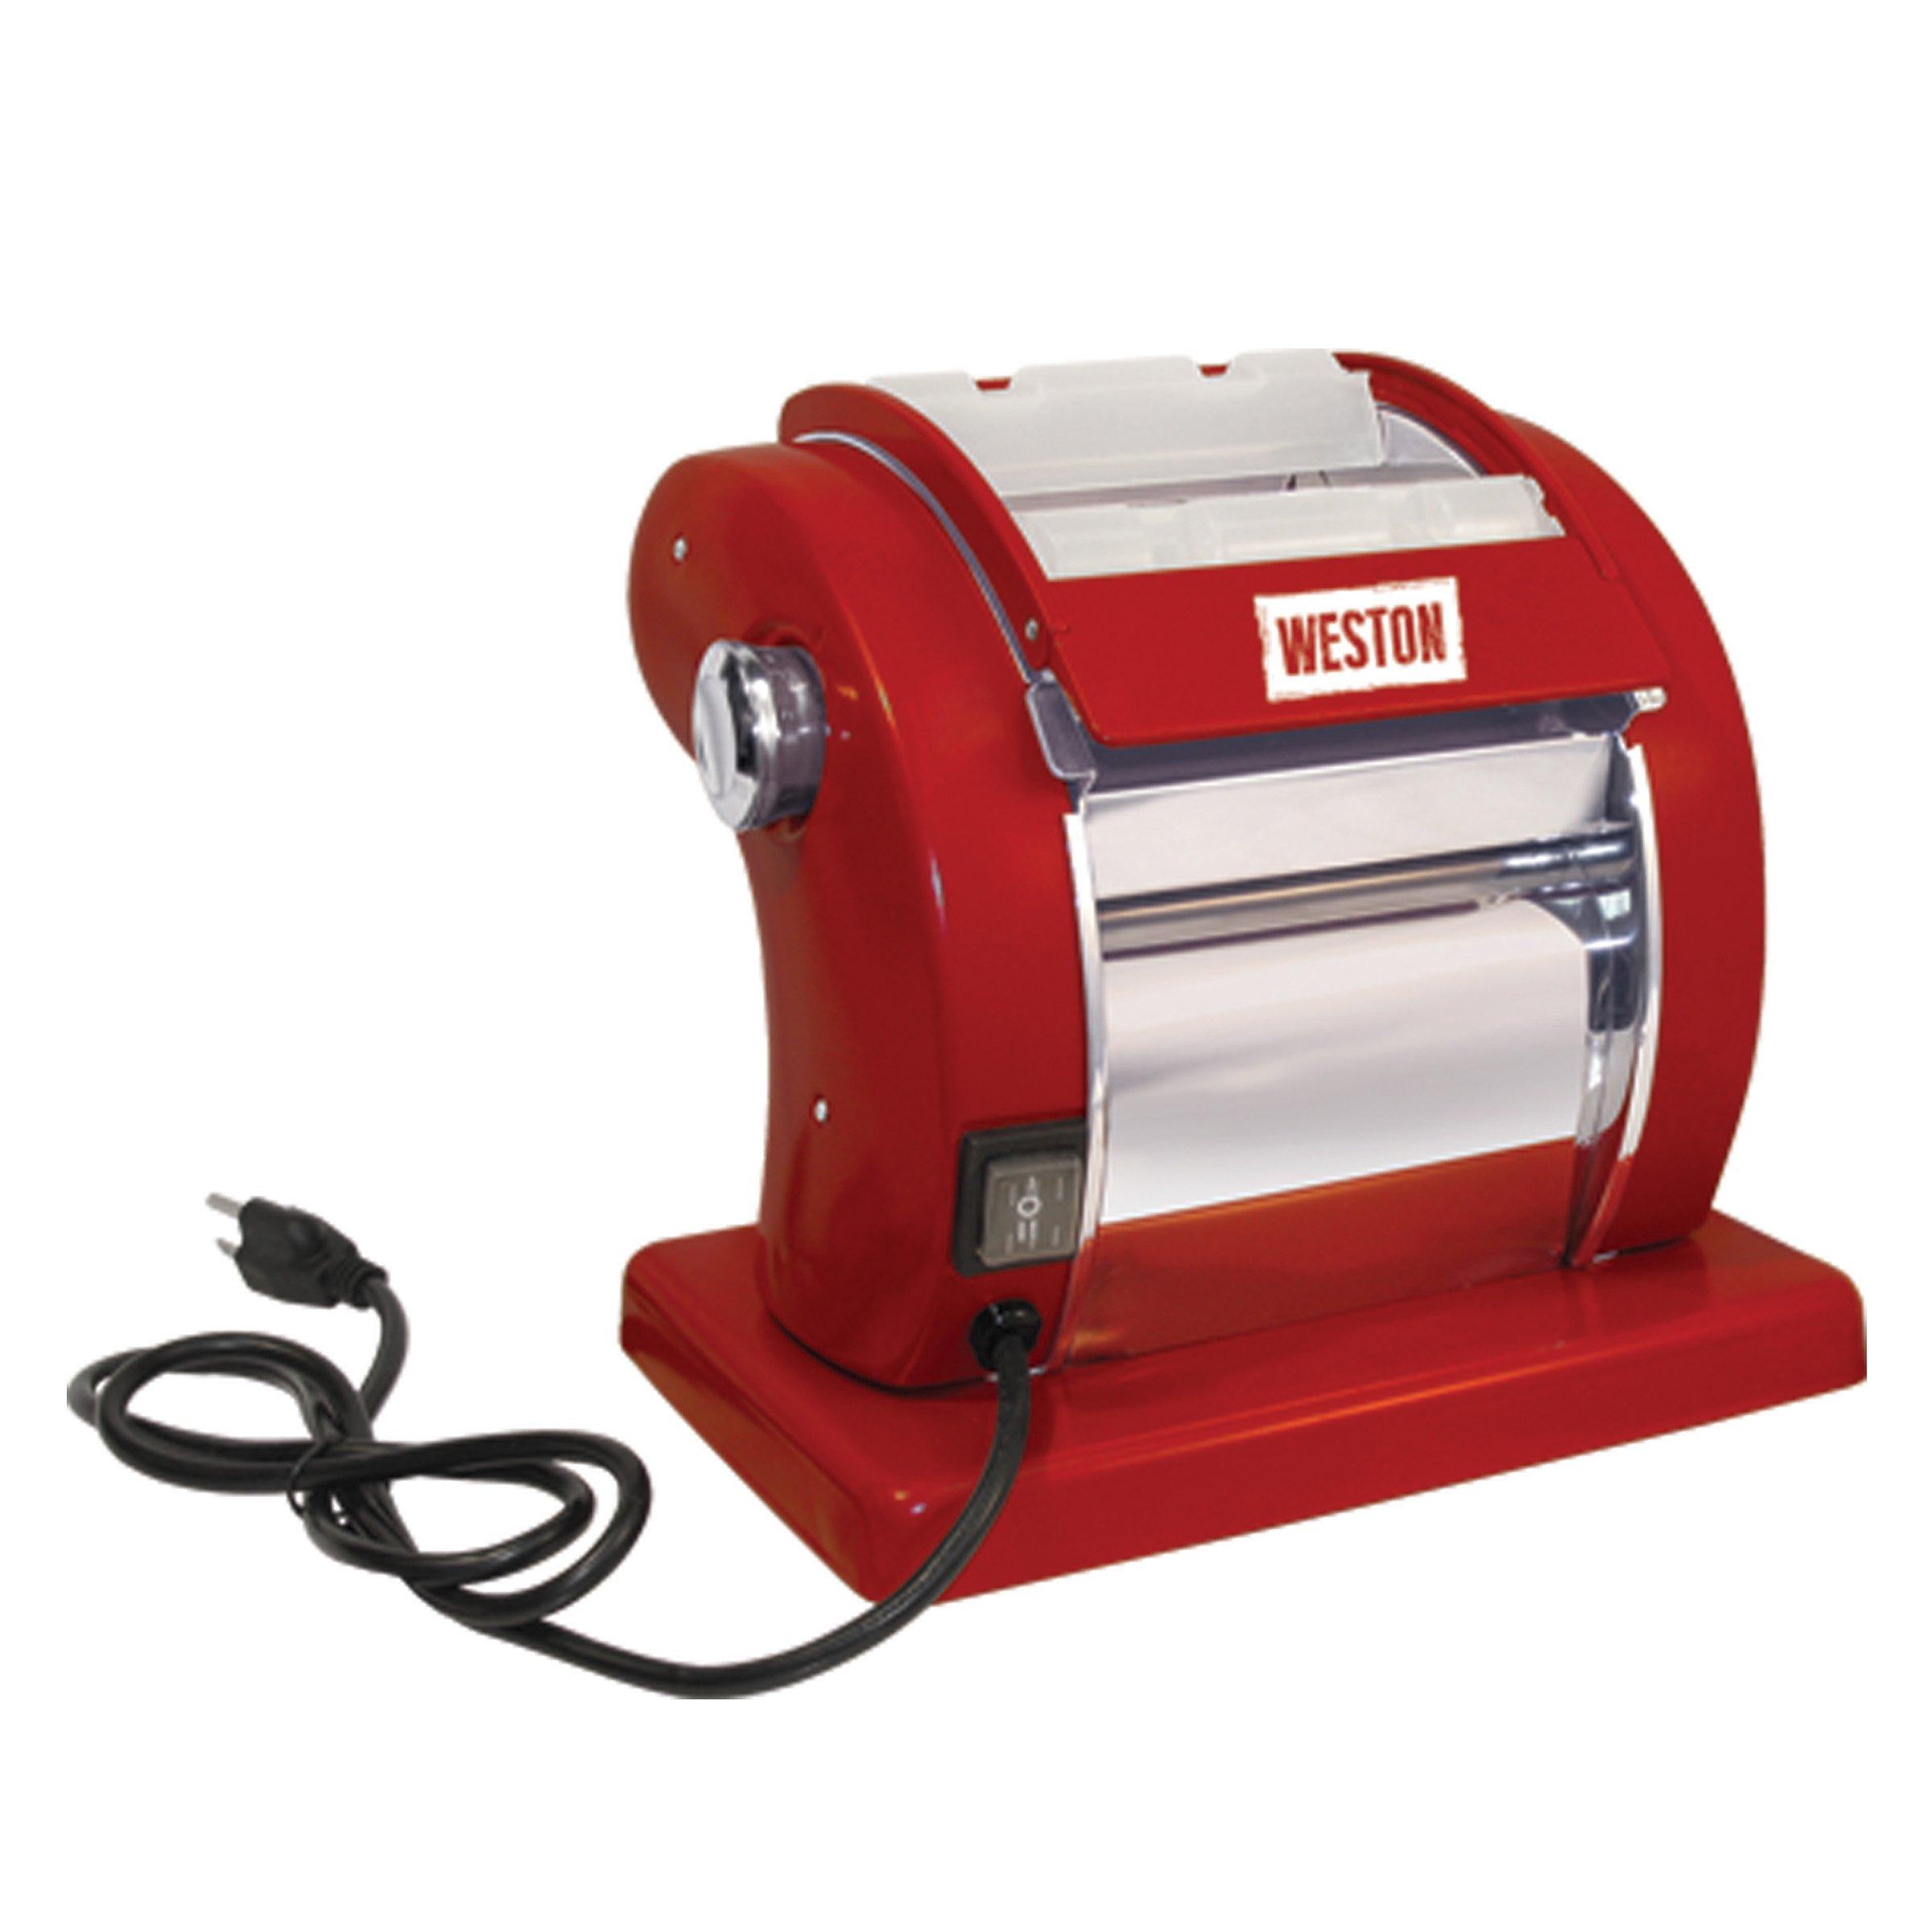 Weston 01-0601-W Electric Pasta Machine, Red by Weston